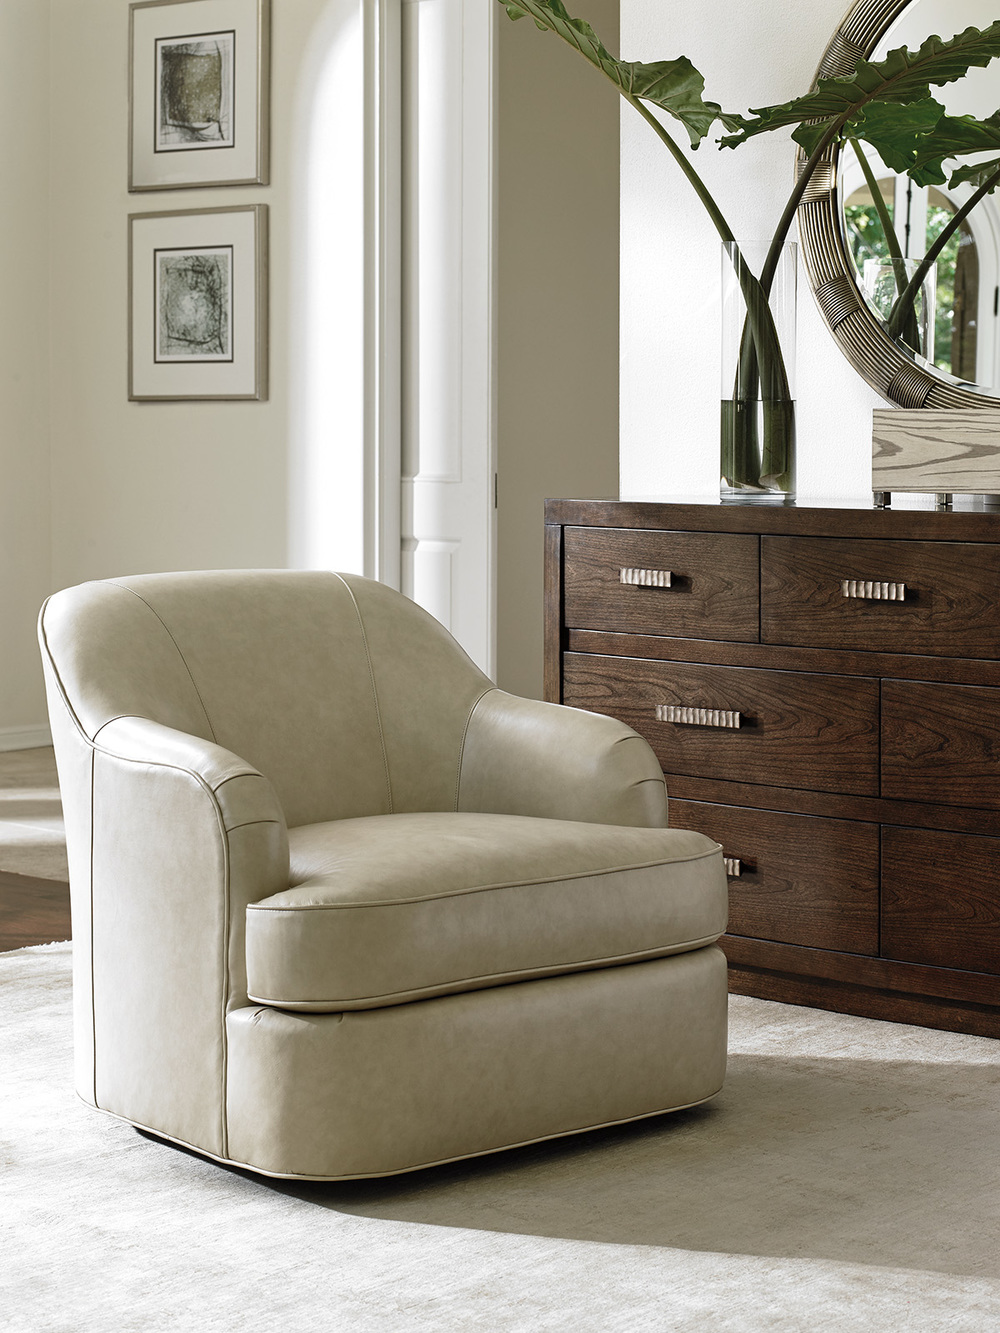 Lexington - Alta Vista Leather Swivel Chair